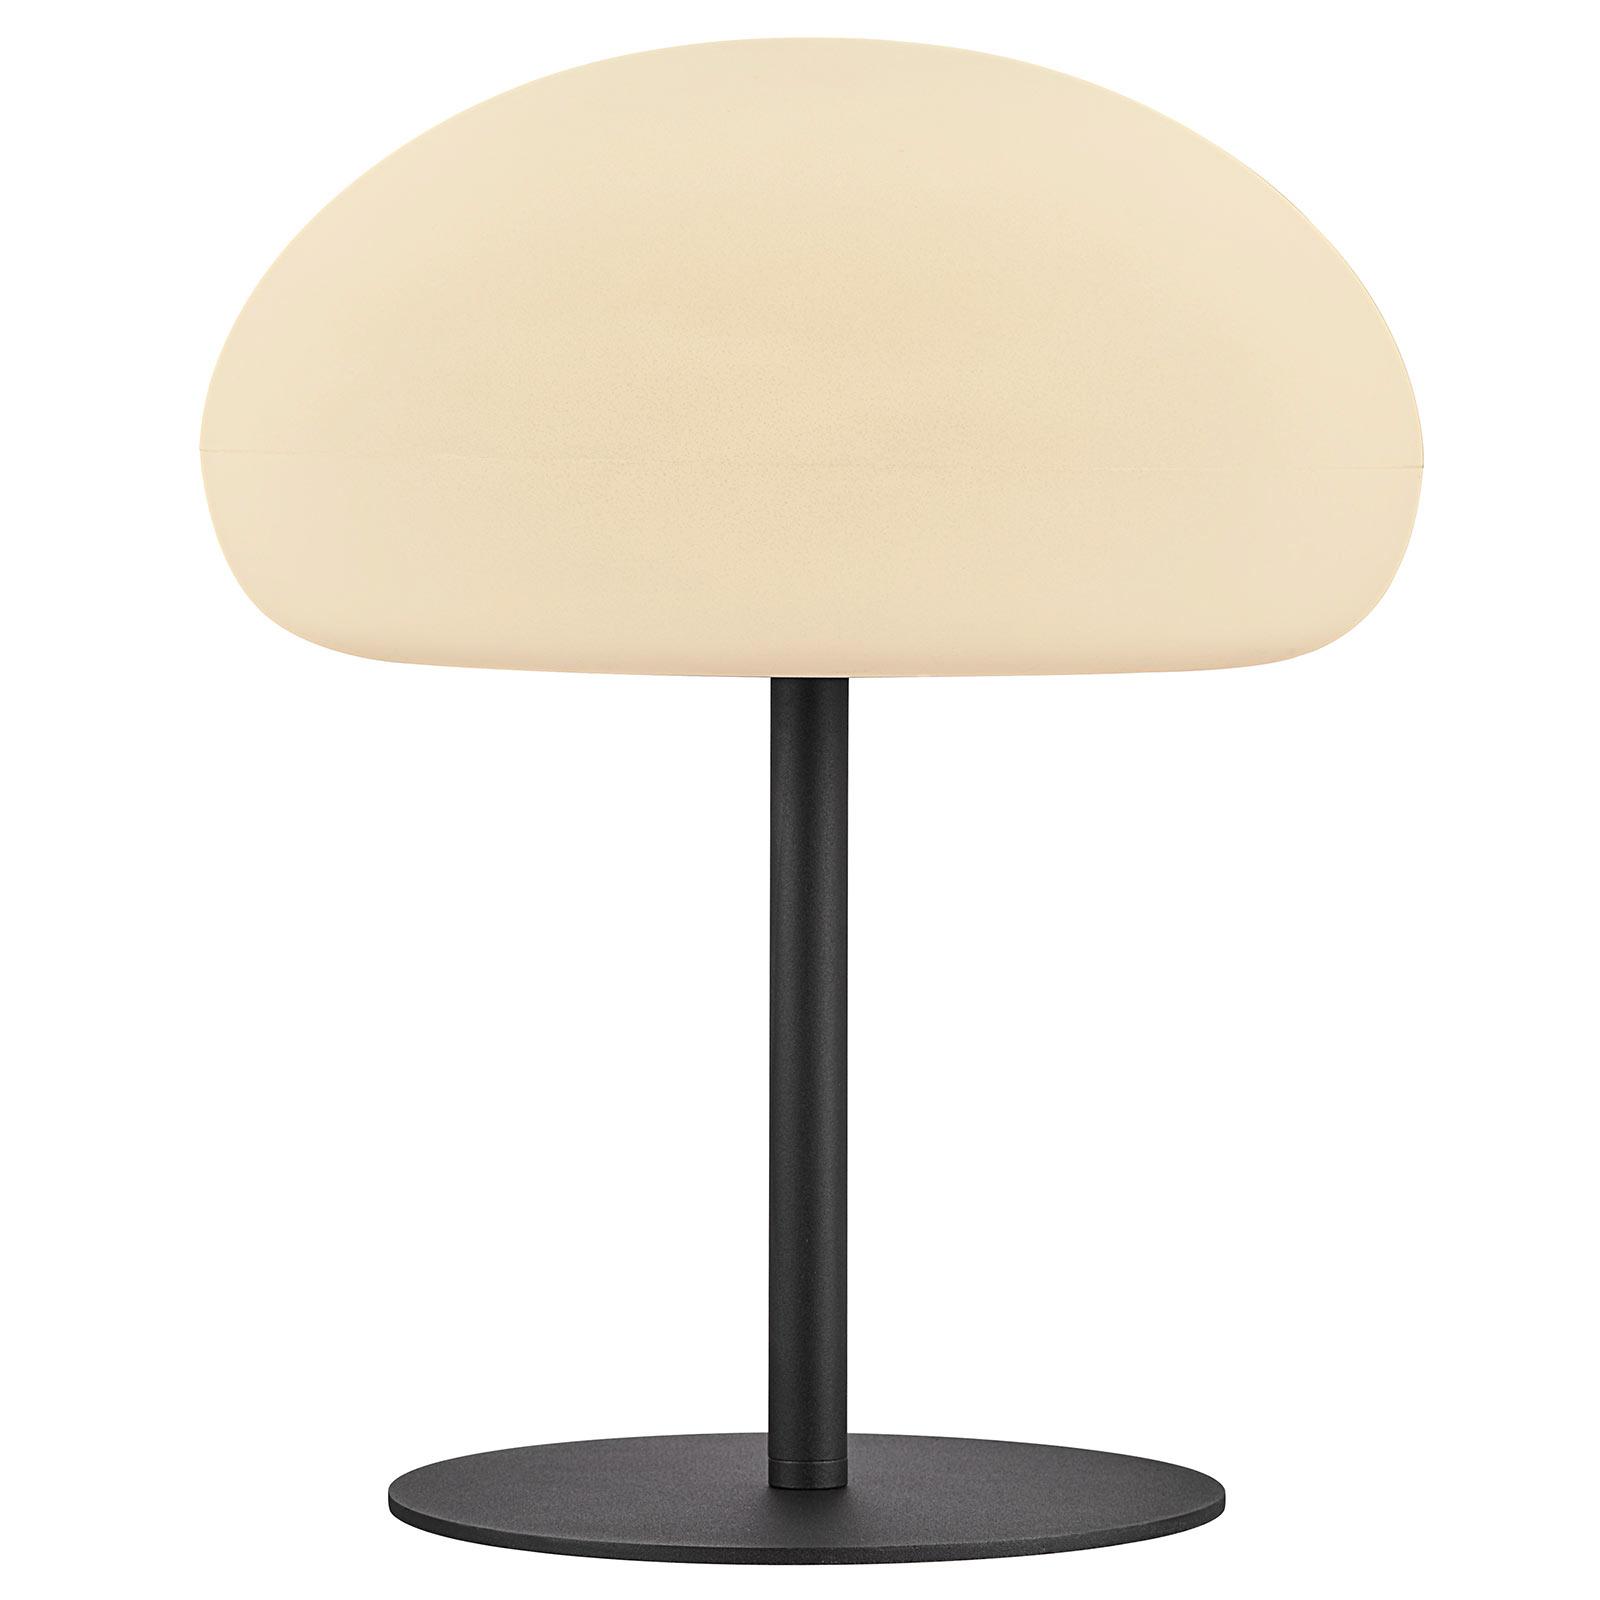 LED-Tischlampe Sponge table mit Akku, 40,5 cm hoch